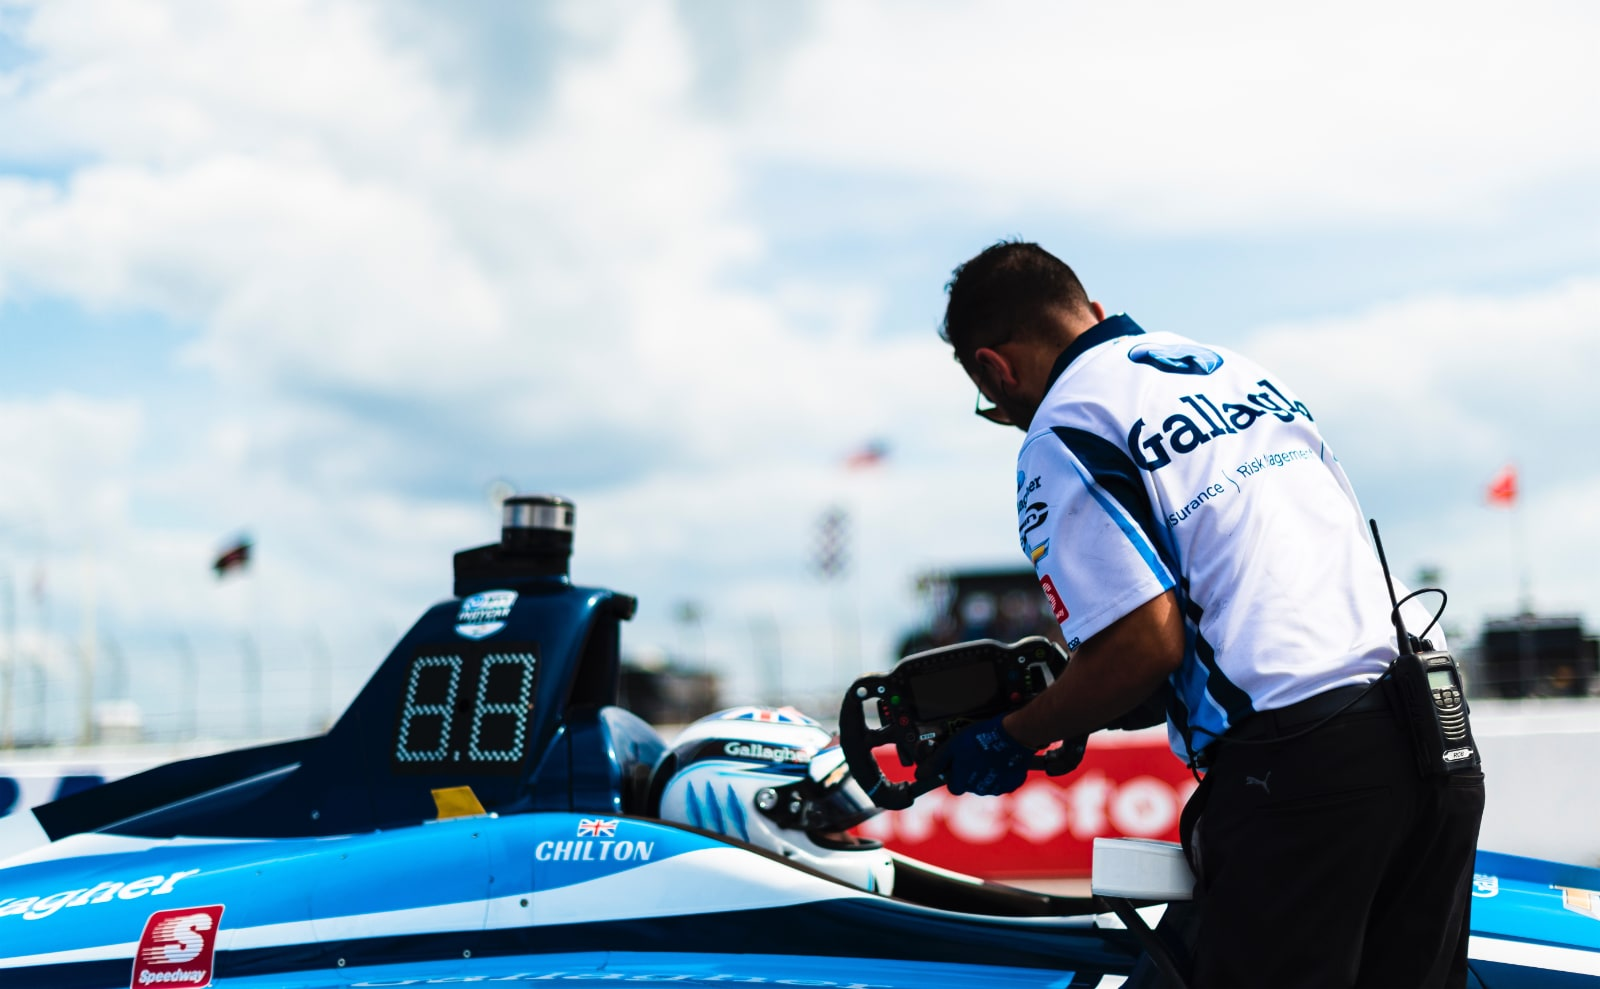 Max Chilton on Grand Prix of St. Petersburg pit lane